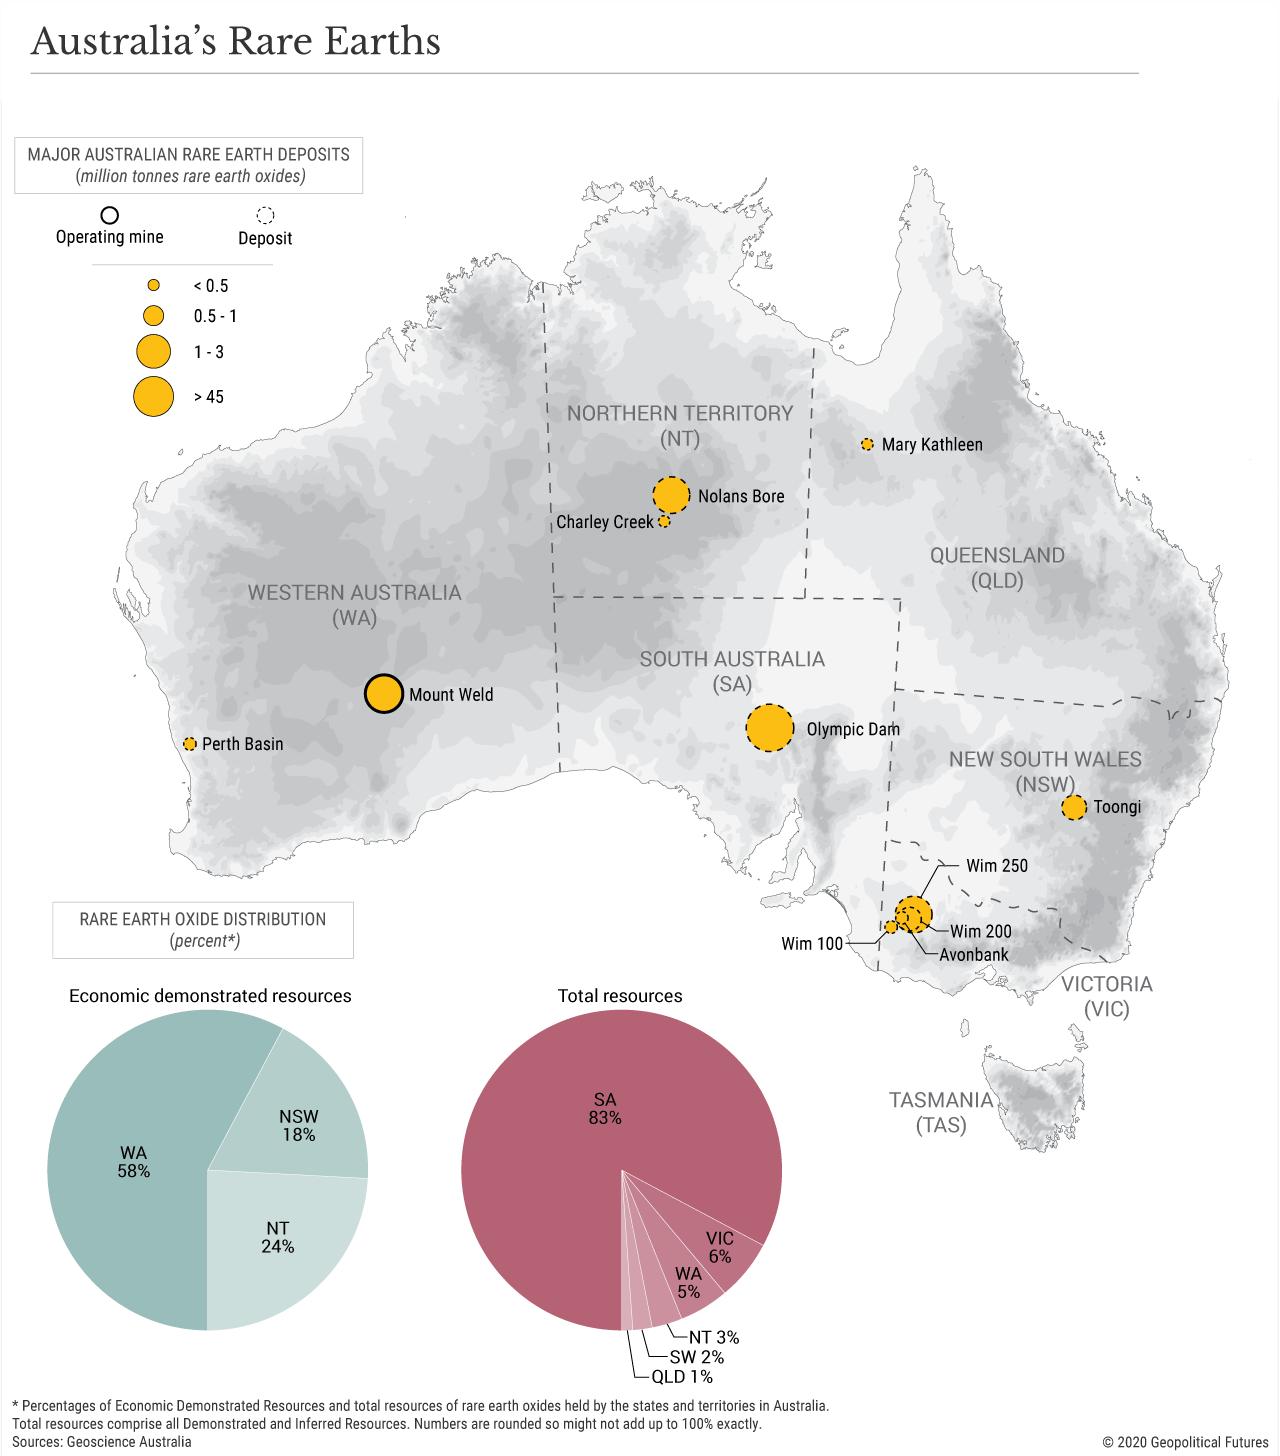 Australia's Rare Earths